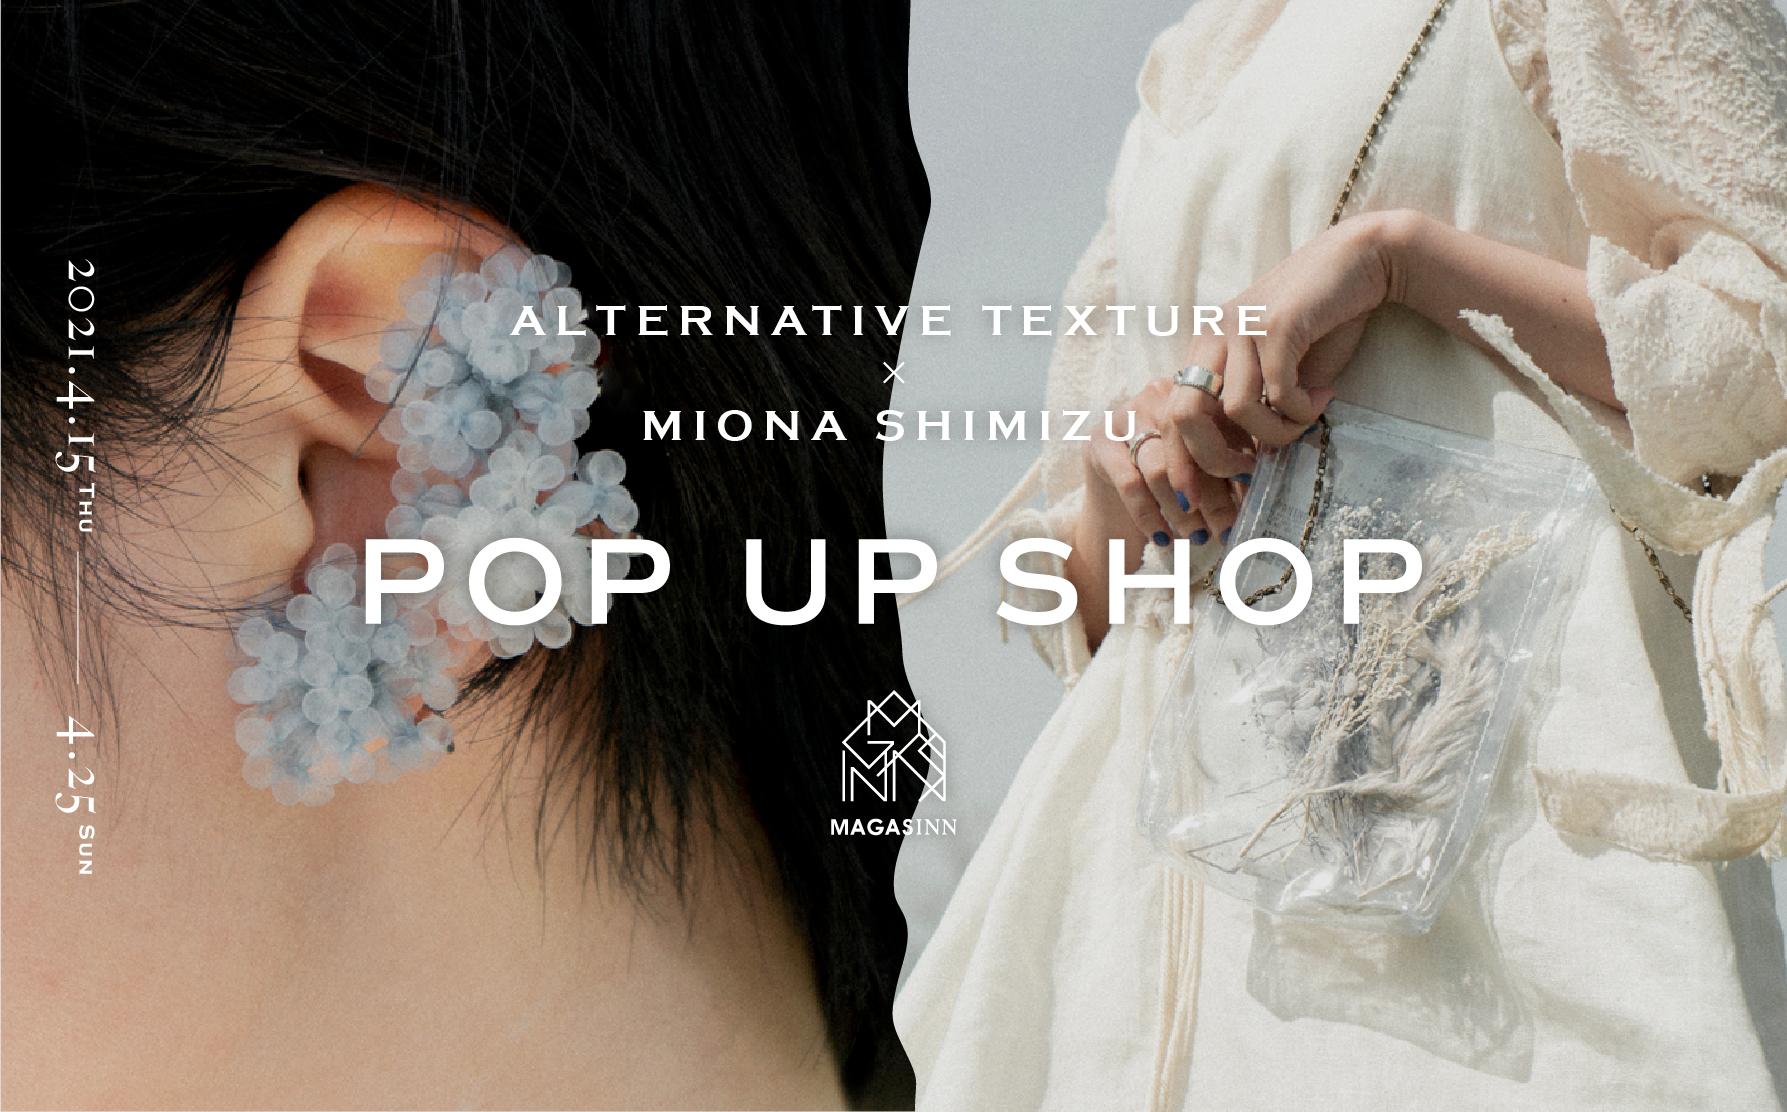 ALTERNATIVE TEXTURE × MINONA SHIMIZU POPUPを開催します。